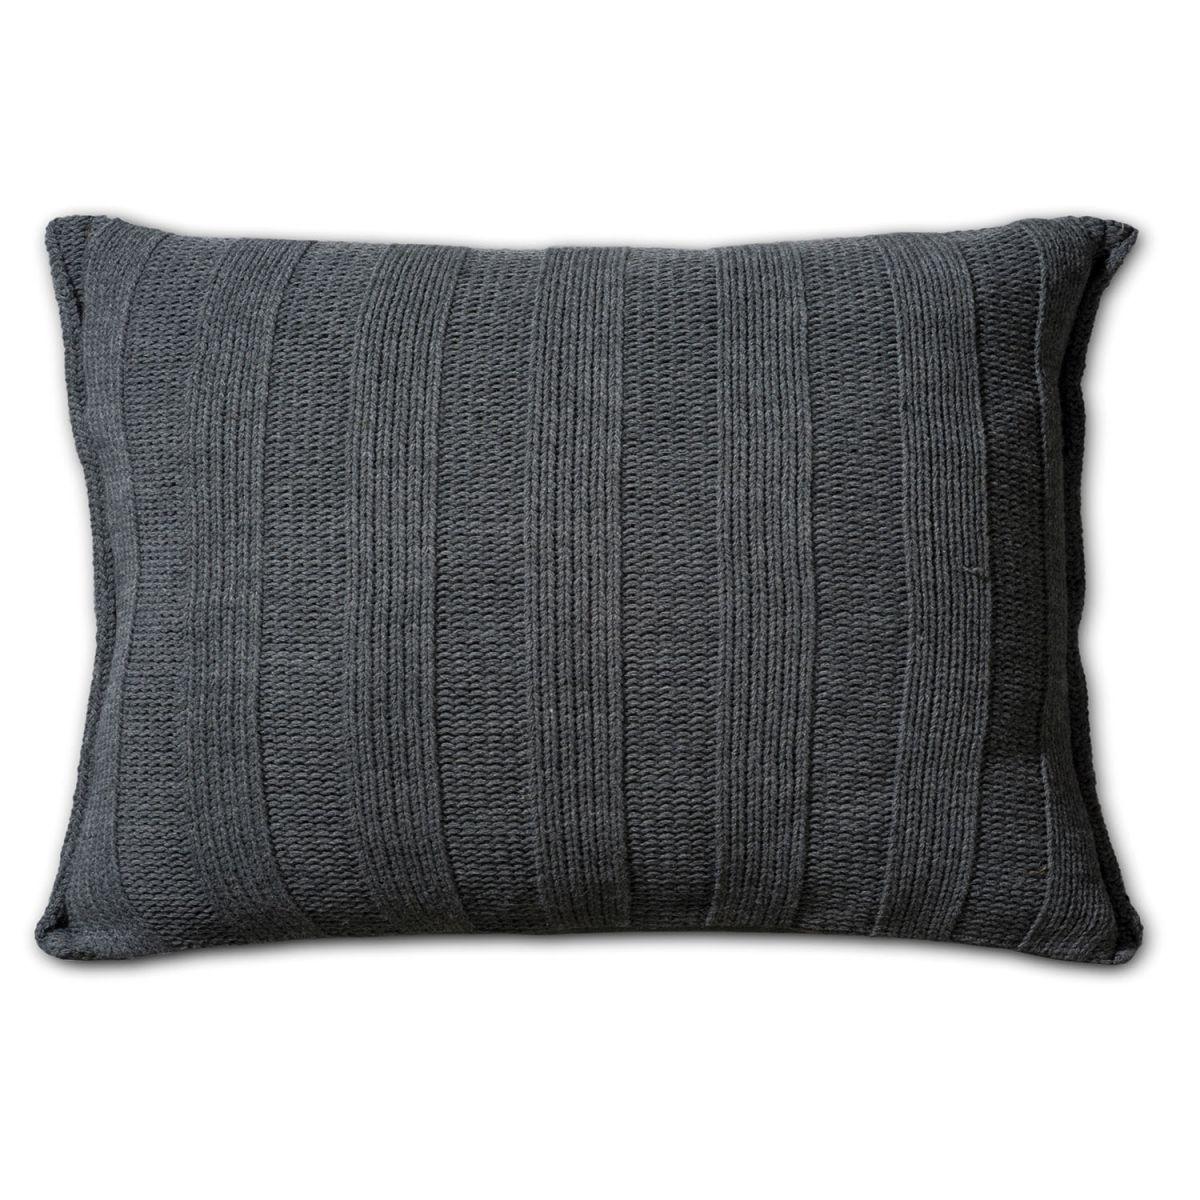 knit factory 1121310 kussen 60x40 6x6 rib antraciet 2